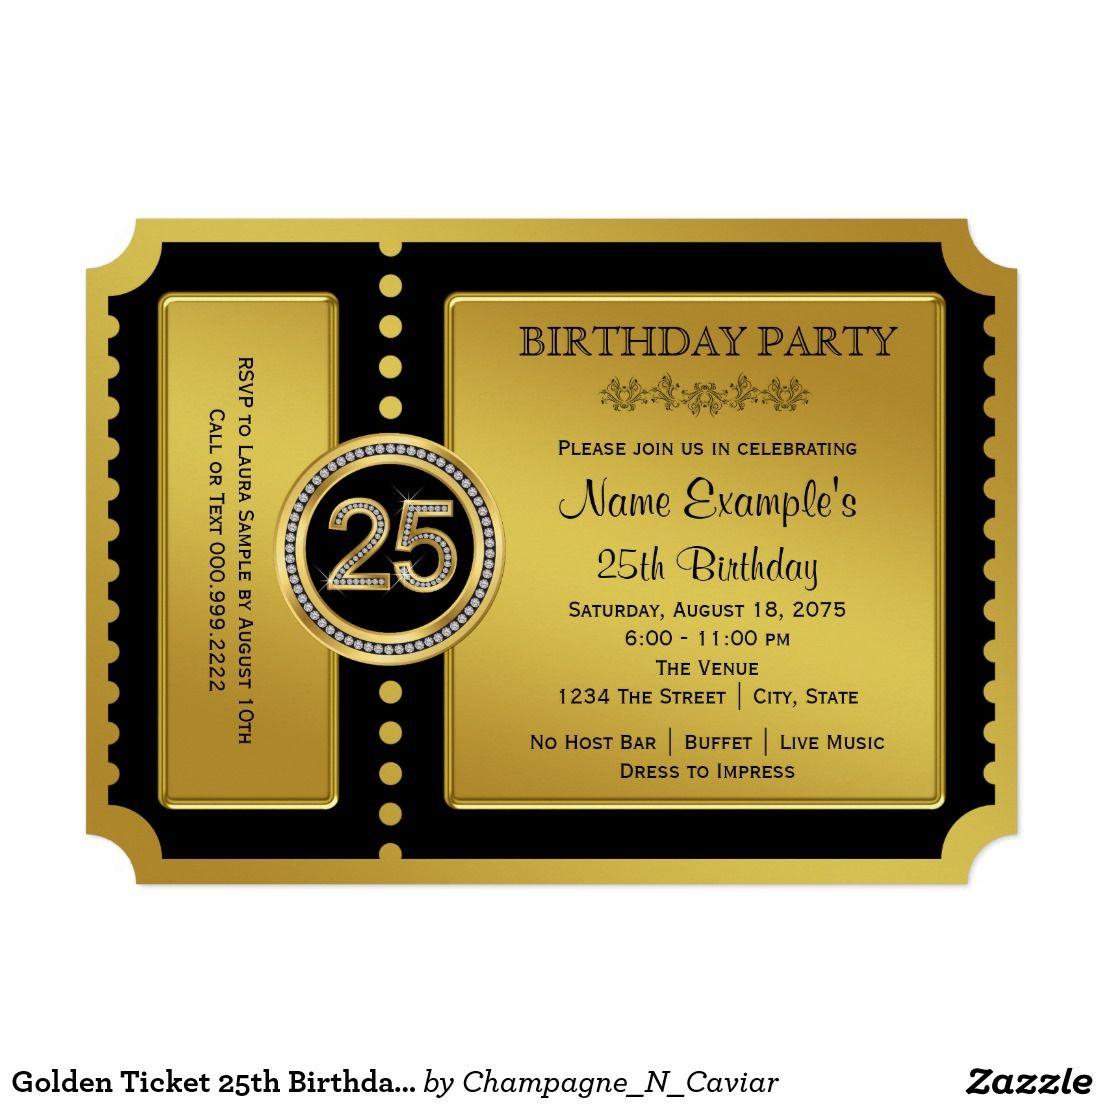 golden ticket 25th birthday party invitation birthday party